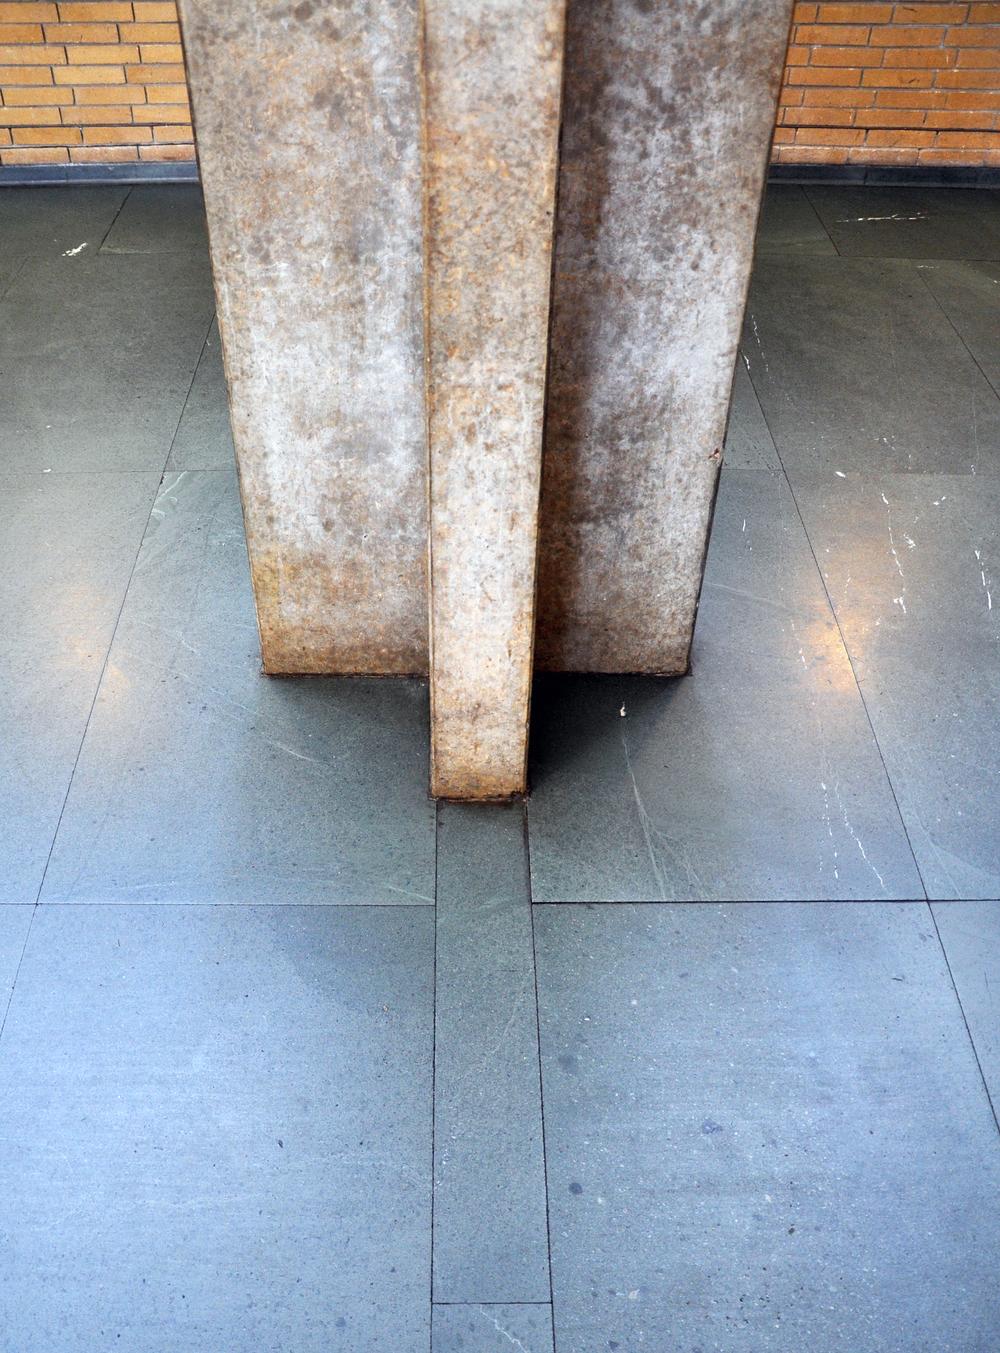 Søjle møder gulv i spisesalen